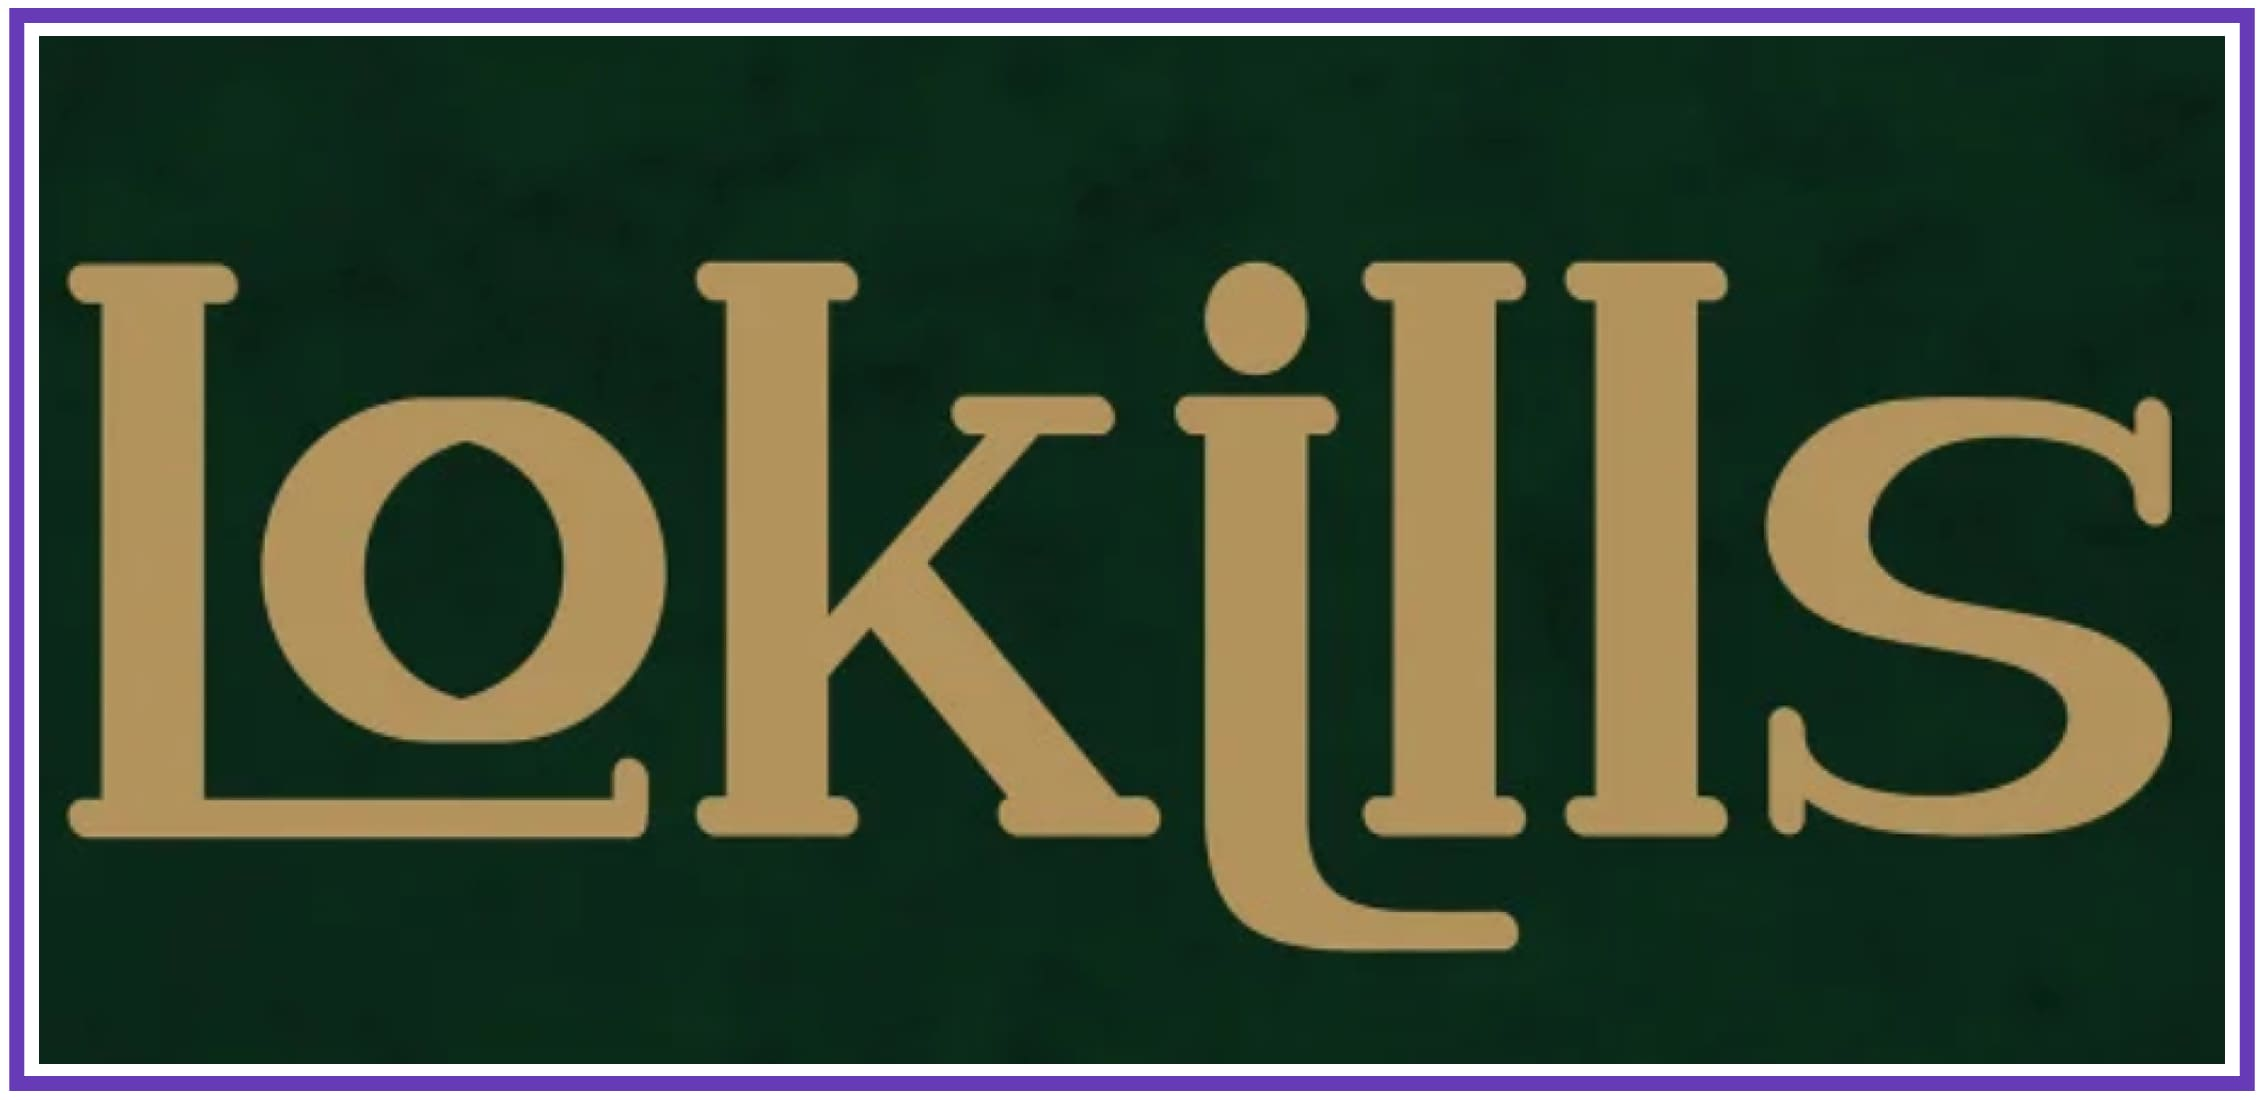 Beautiful Lokills. Punk Font.